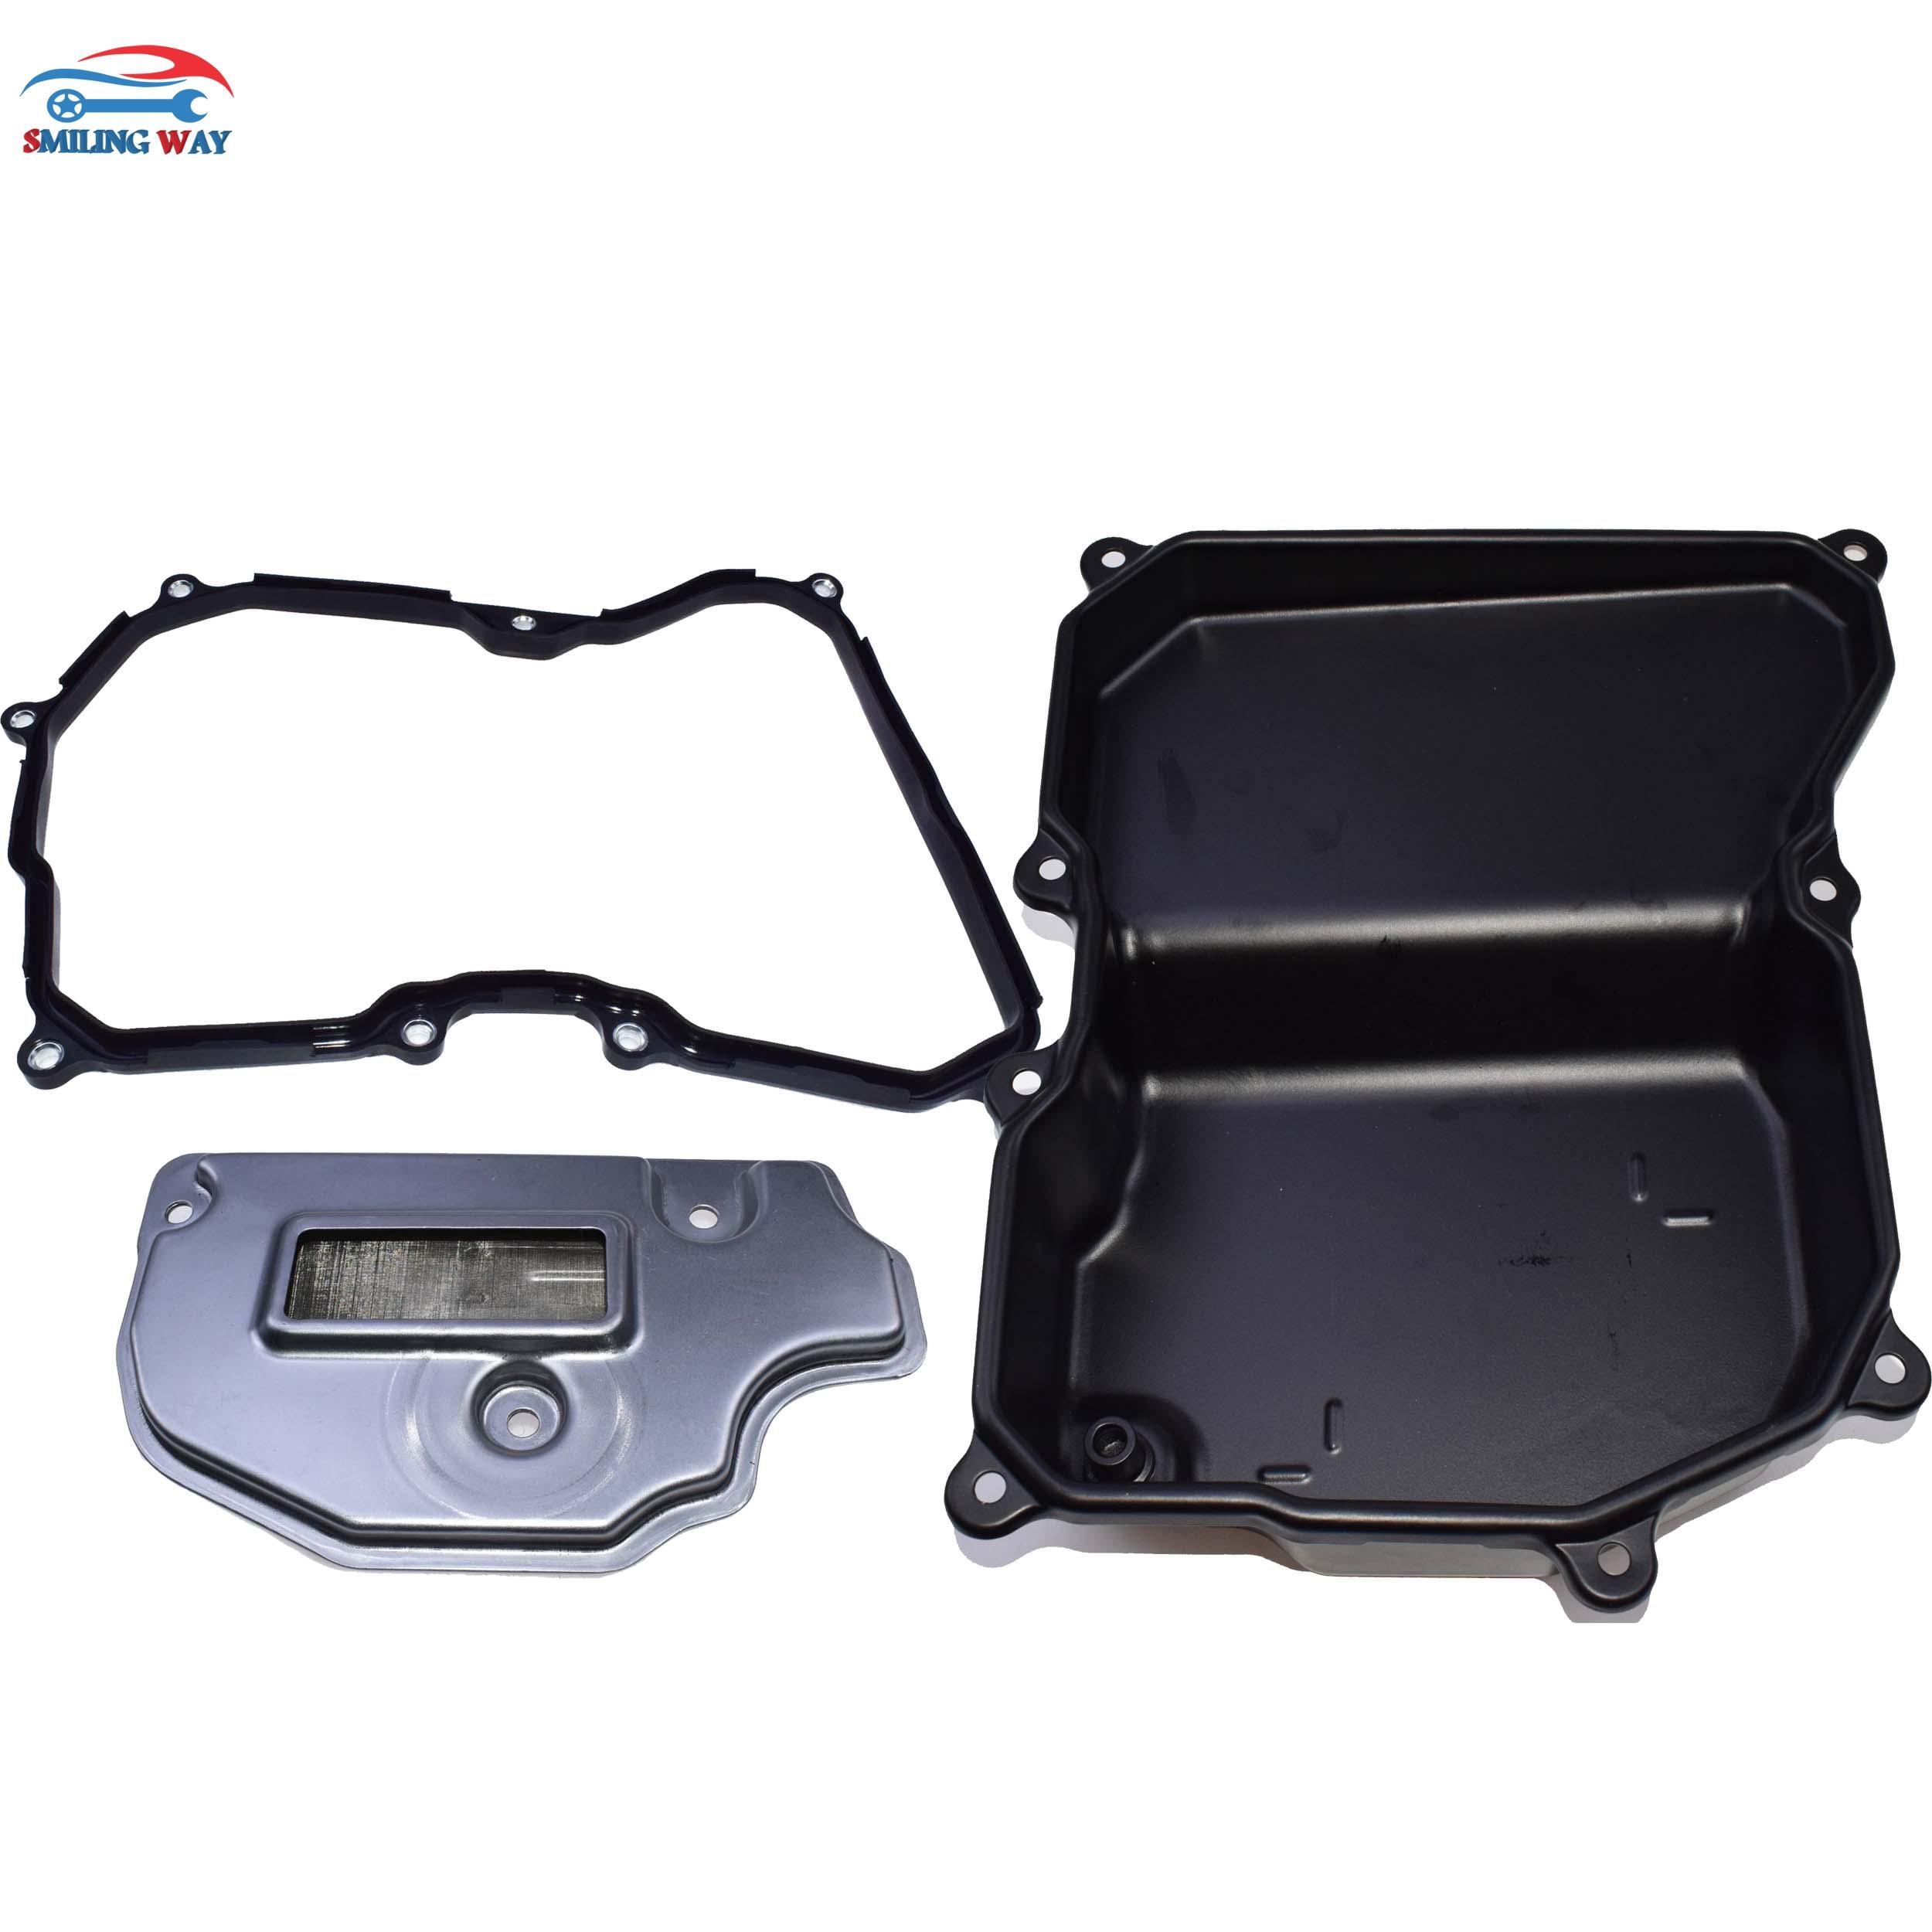 Automatic Transmission Filter Gasket Oil Pan For VW Beetle CC Golf Jetta Passat B6 Rabbit GTI